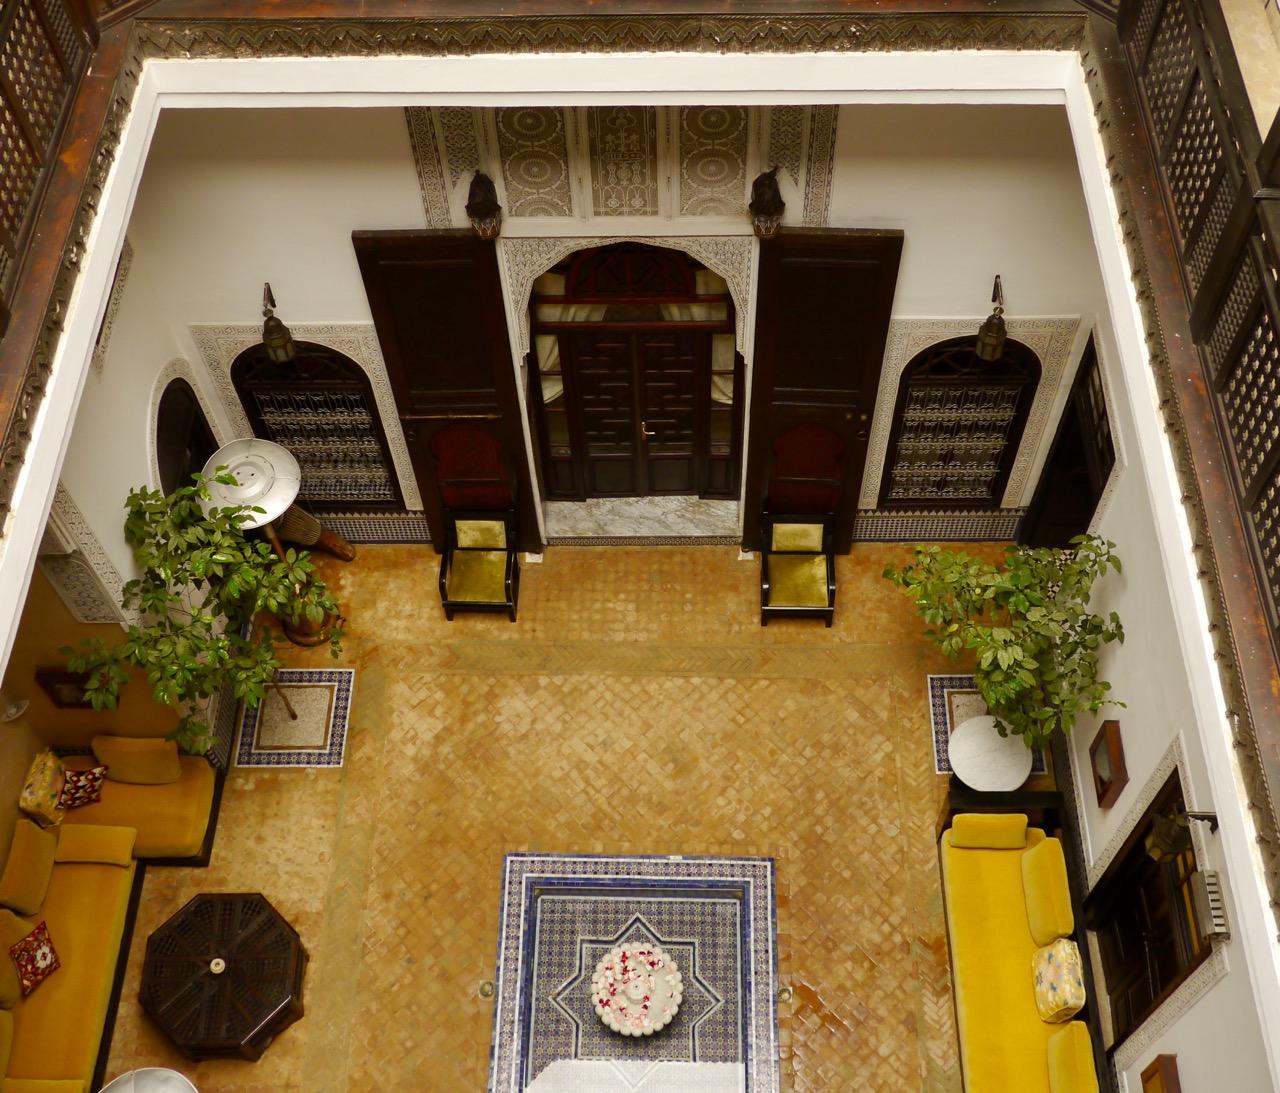 La Maison Bleue, Fes (Medina)